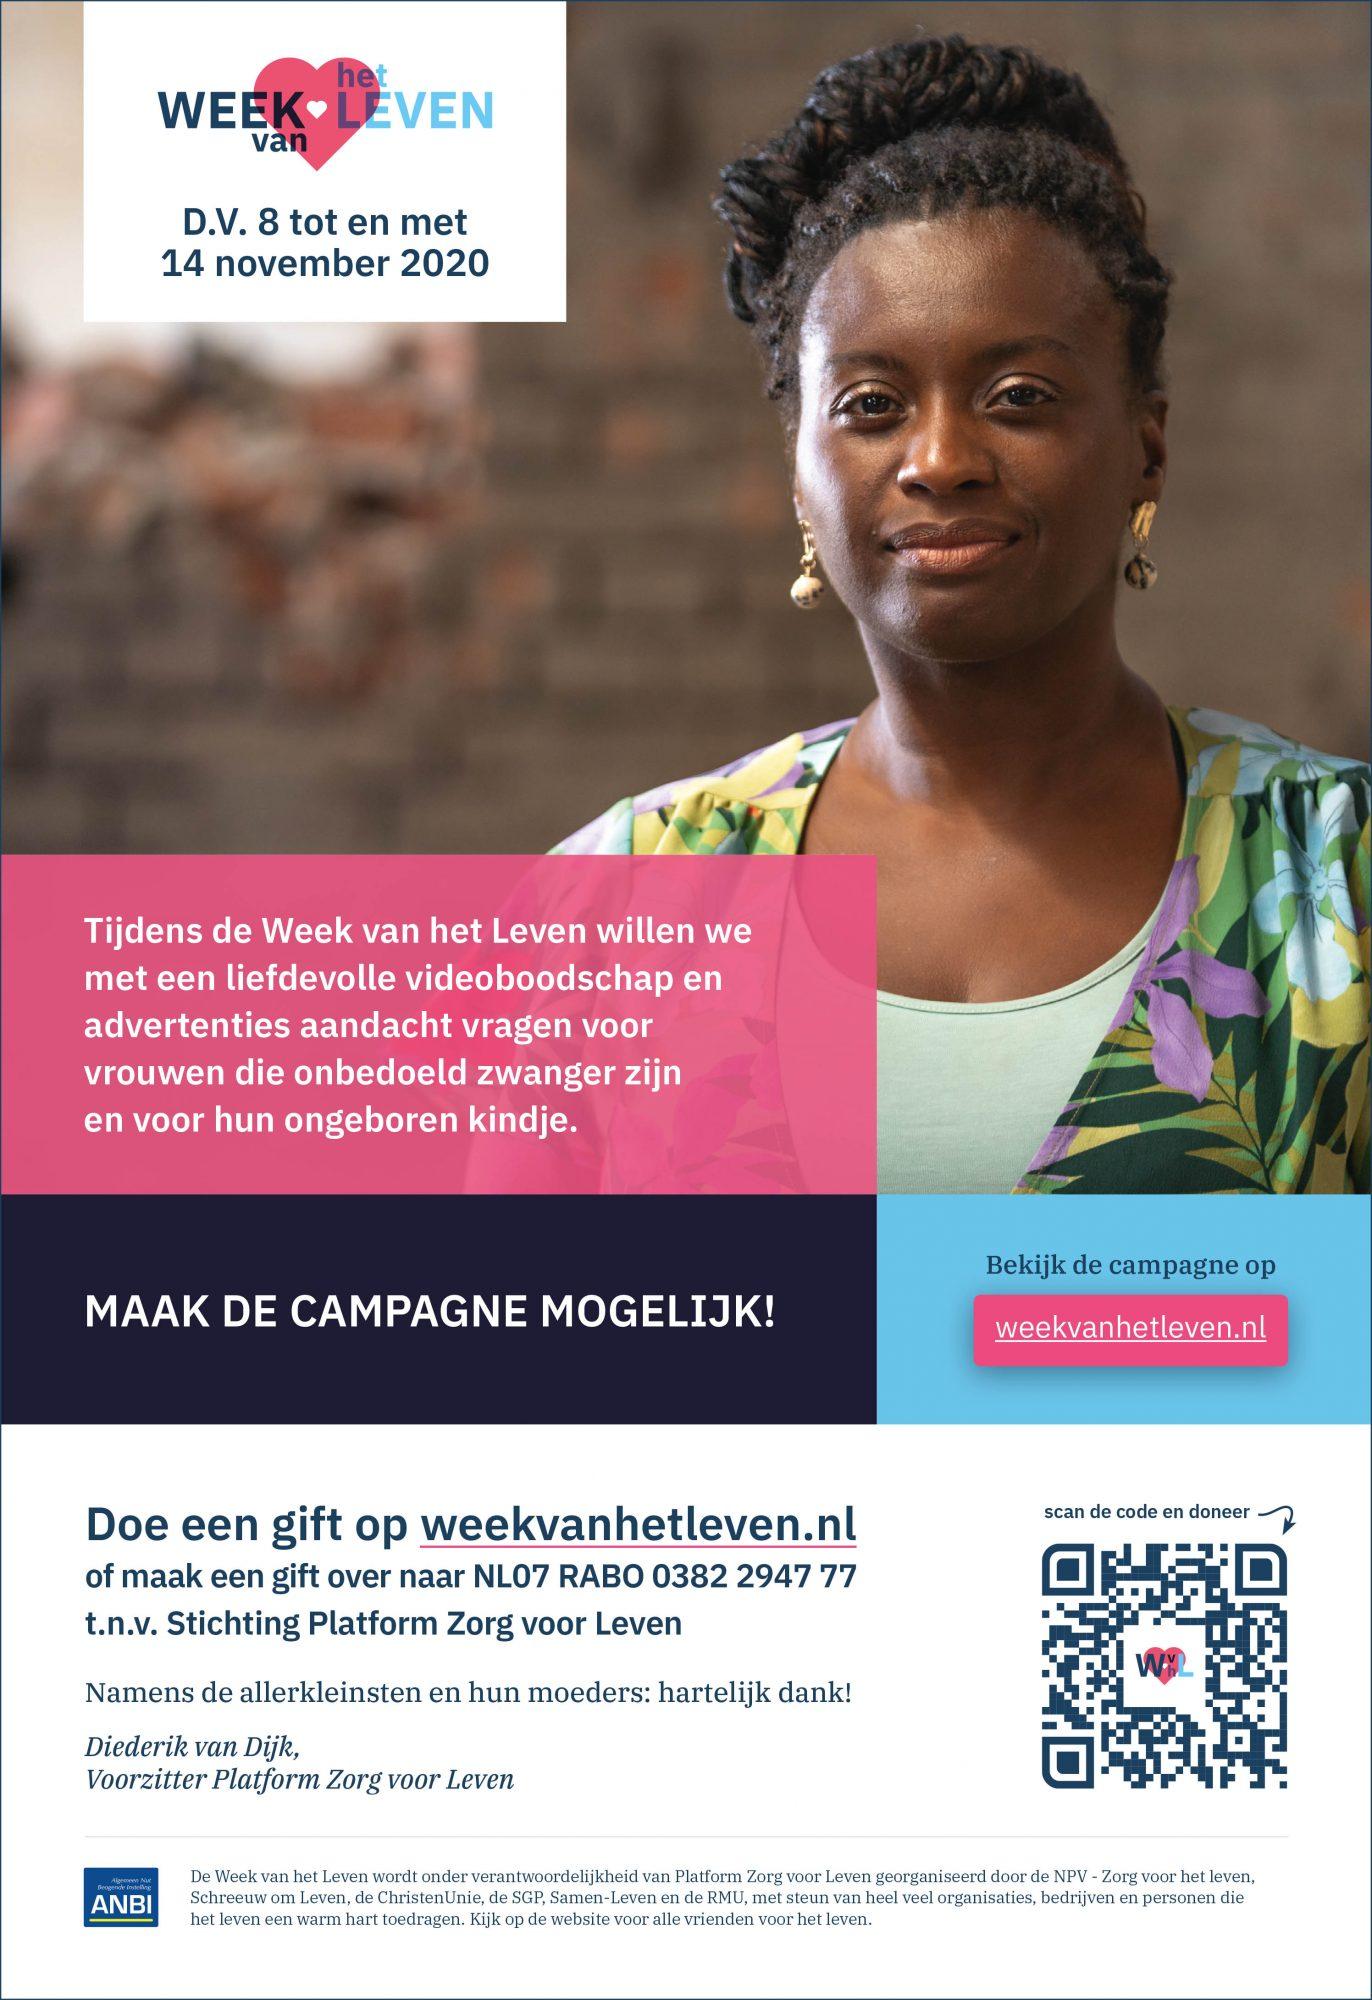 Crowdfundingsadvertentie